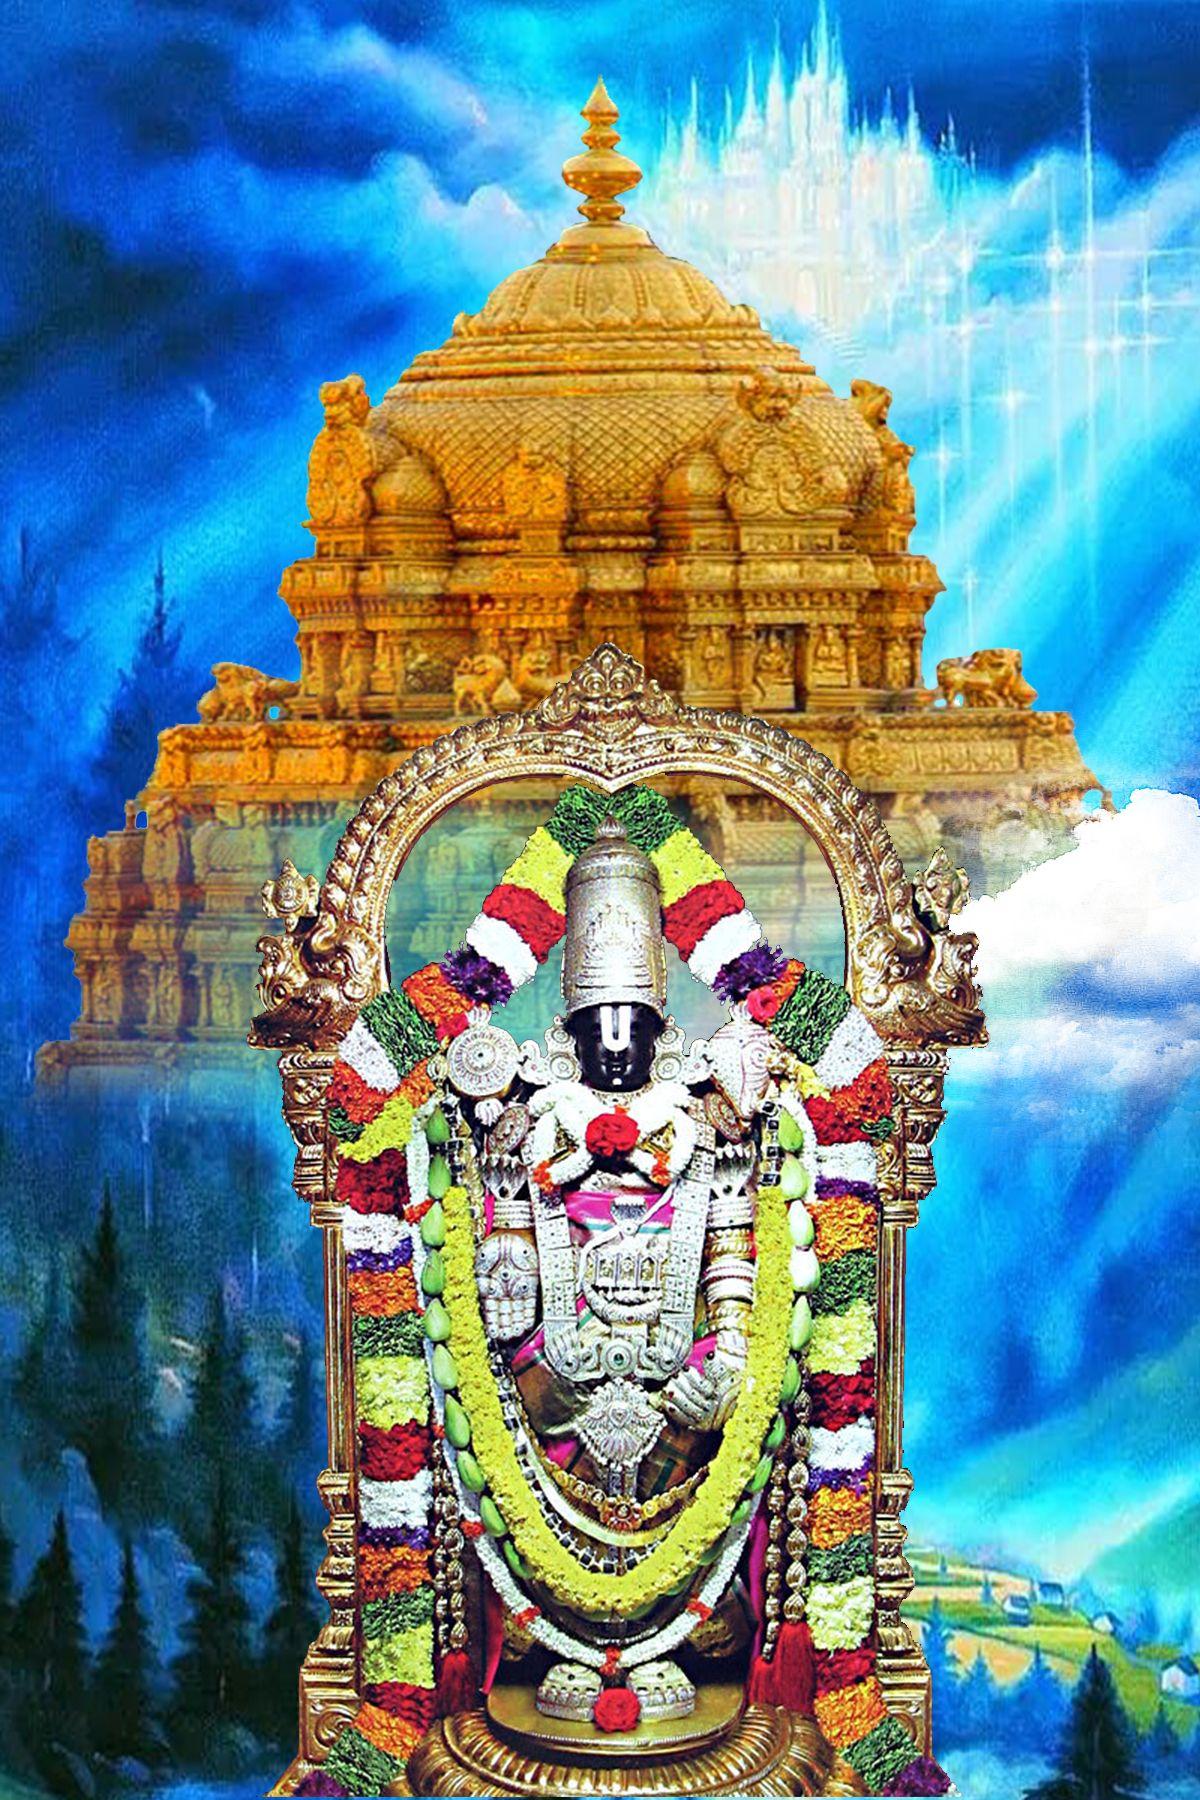 Pin by chandra sekhar on balaji Lord vishnu wallpapers